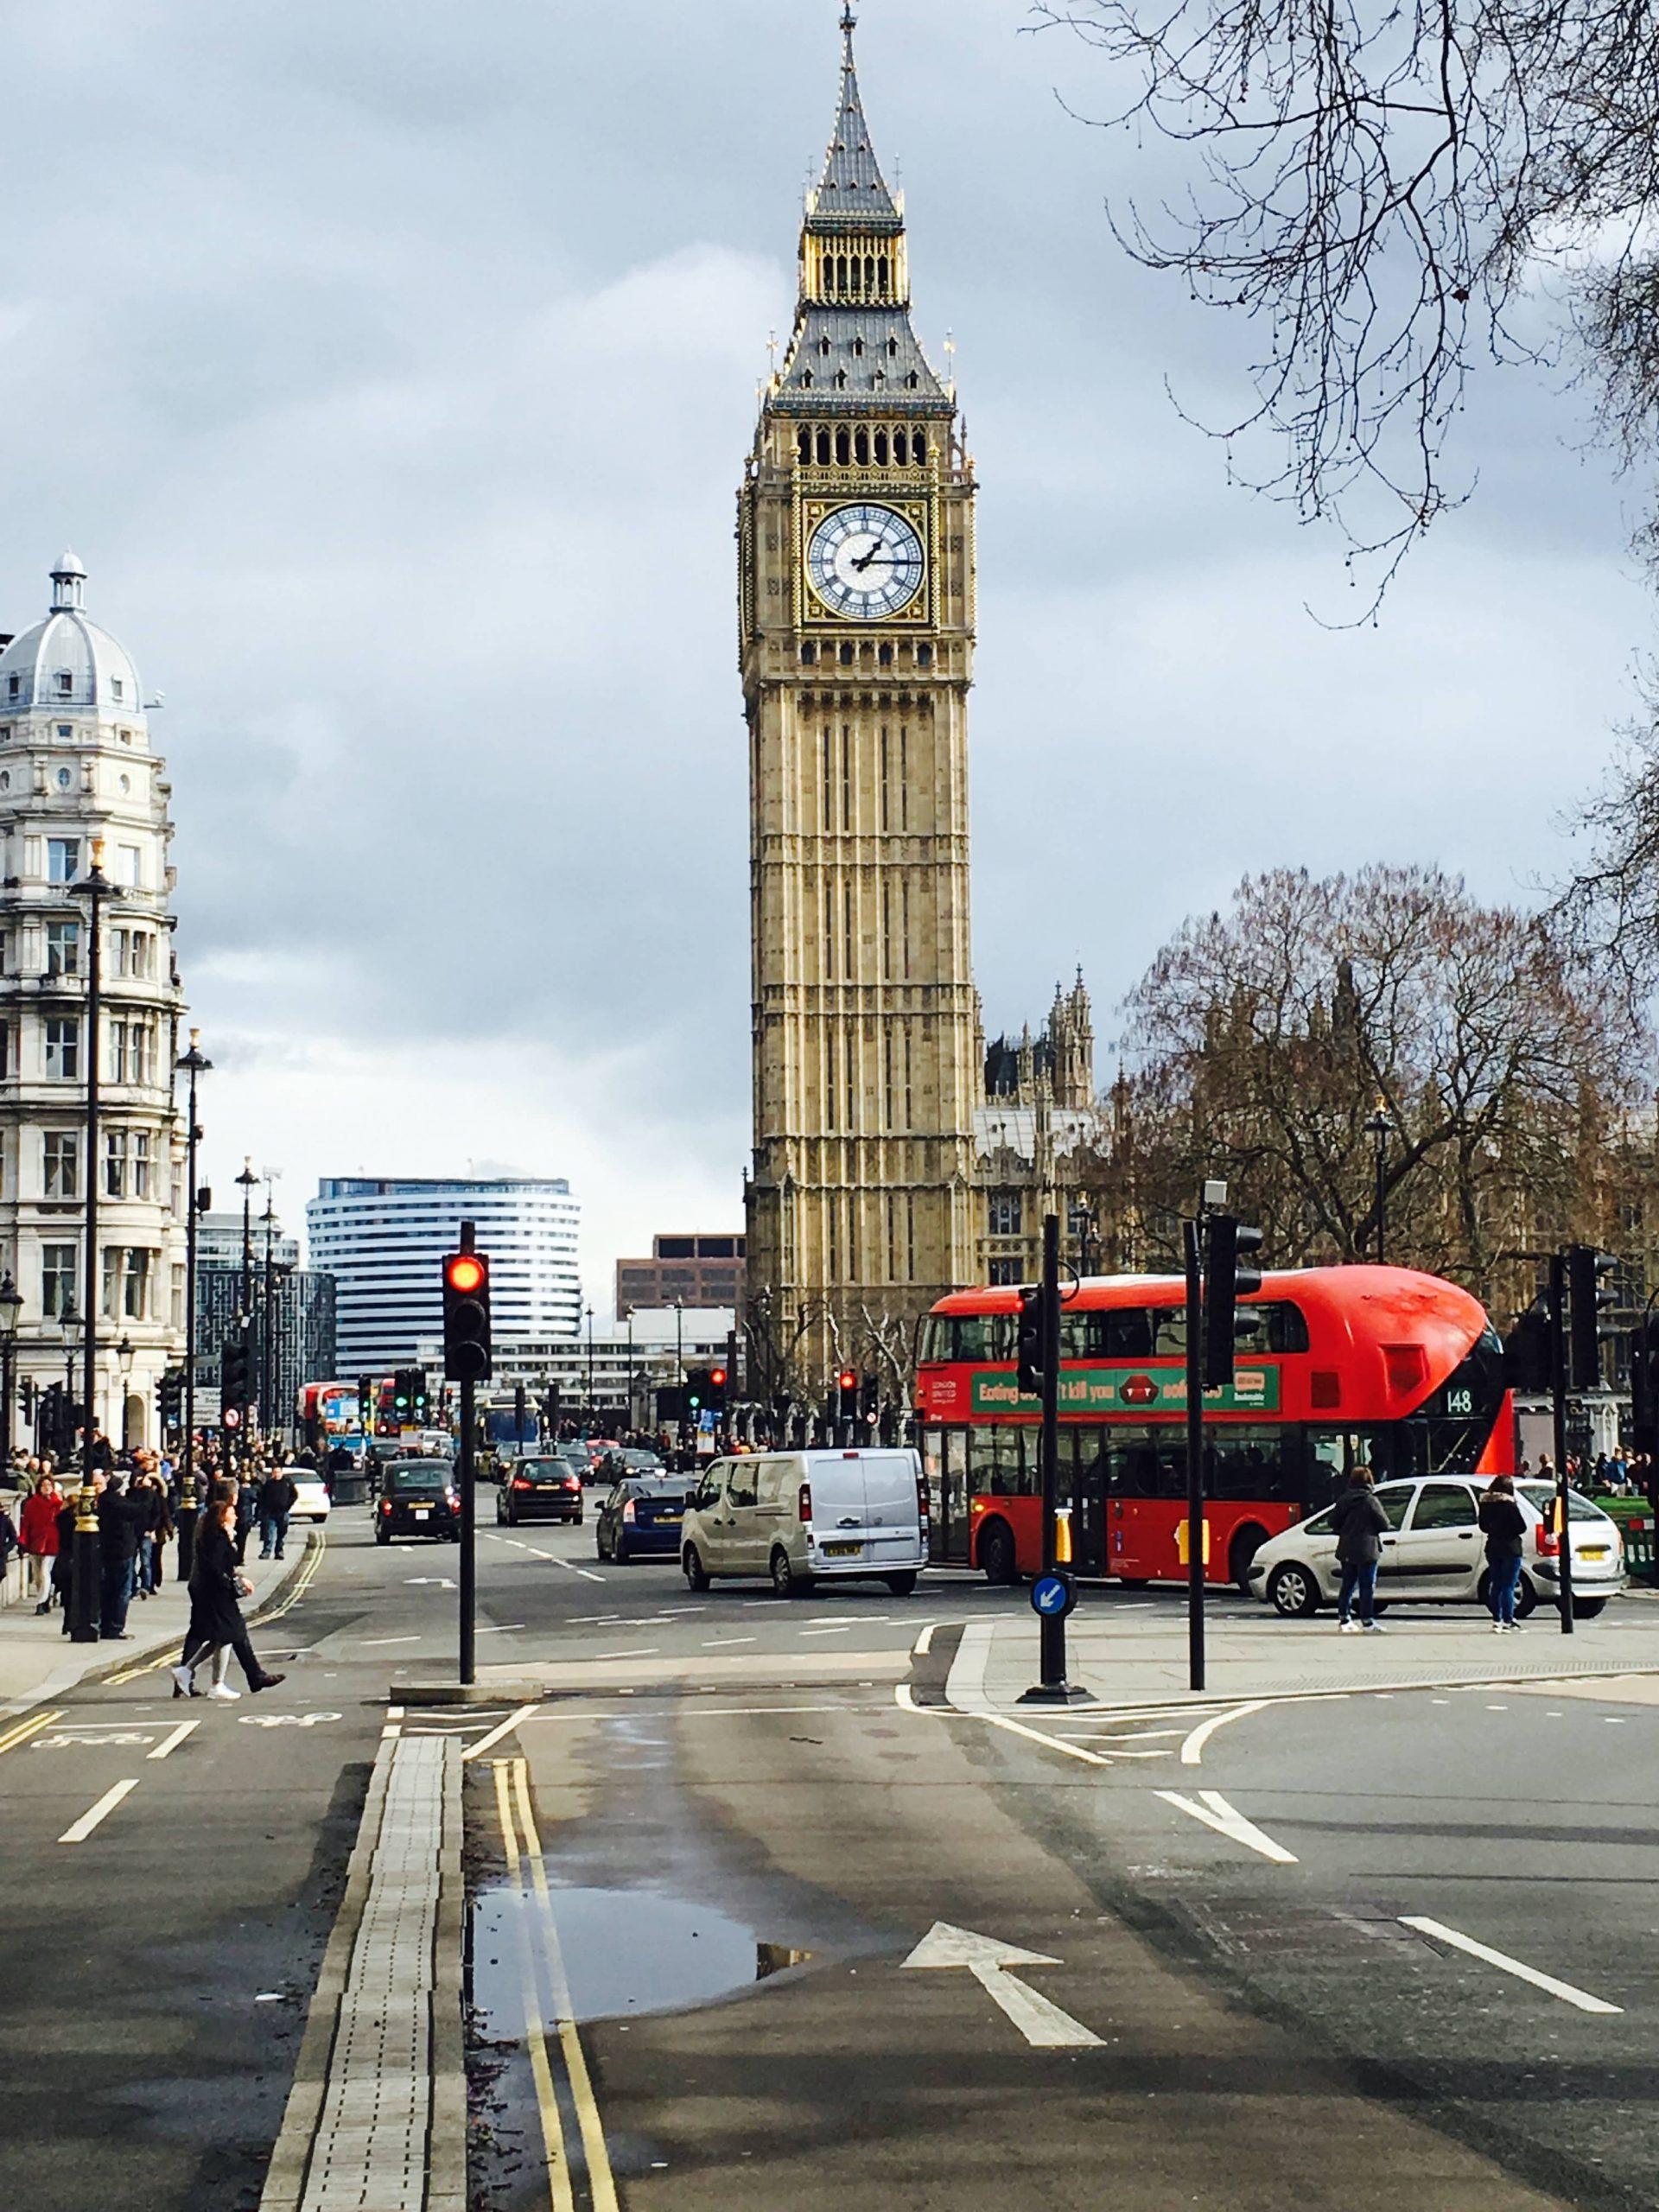 London Travel Tips